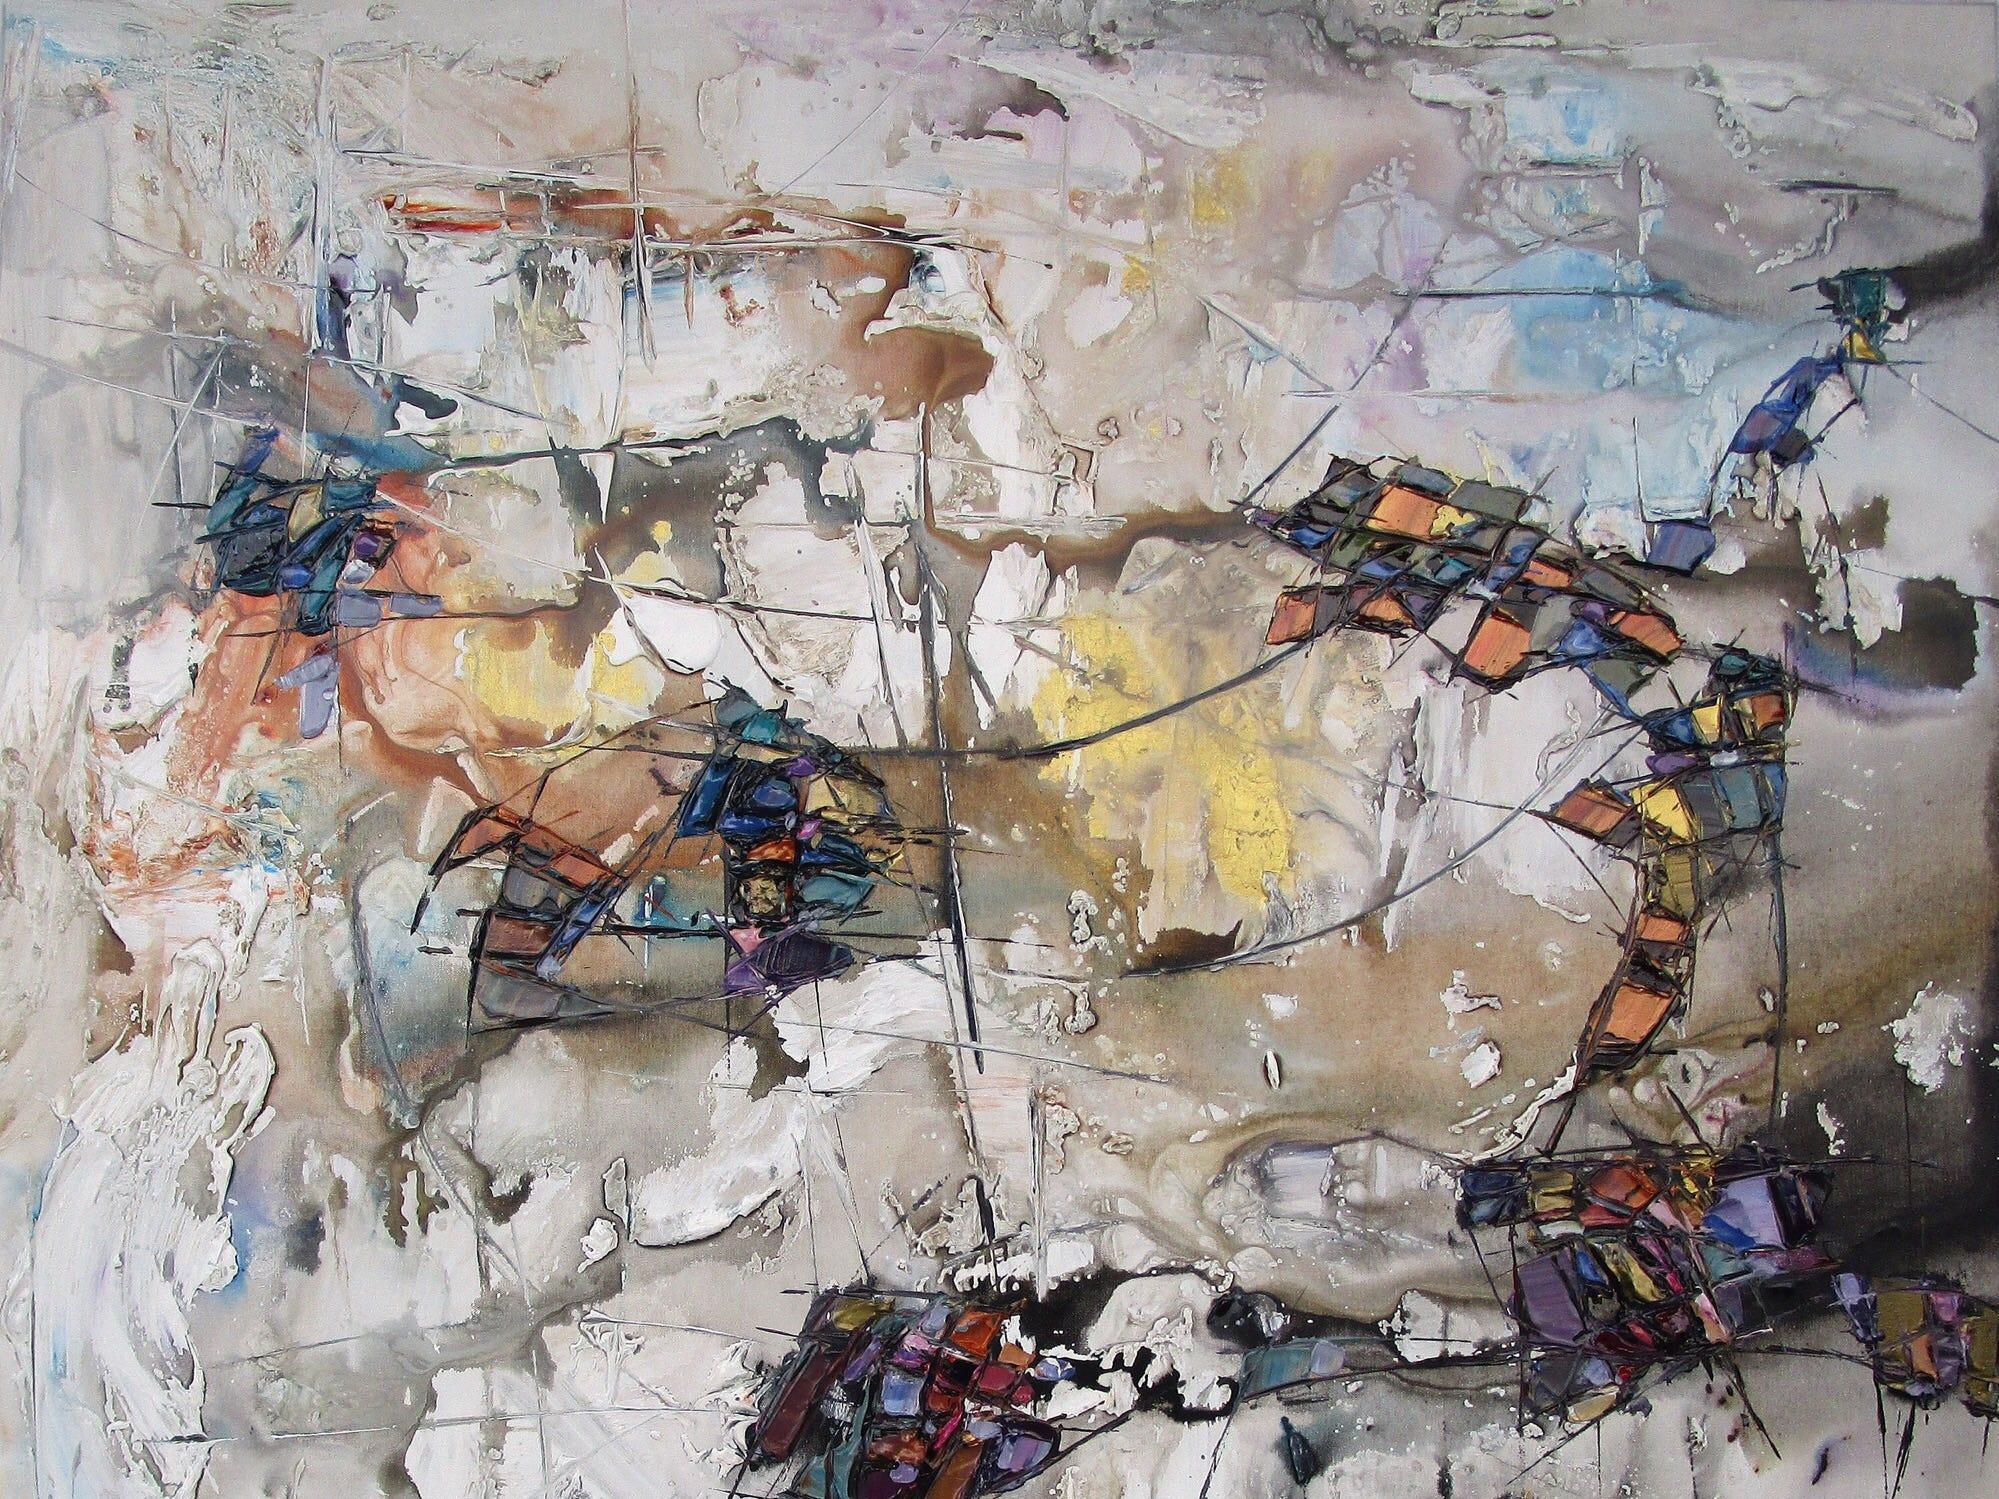 A work by Ukrainian-Canadian artist Maya Eventov.